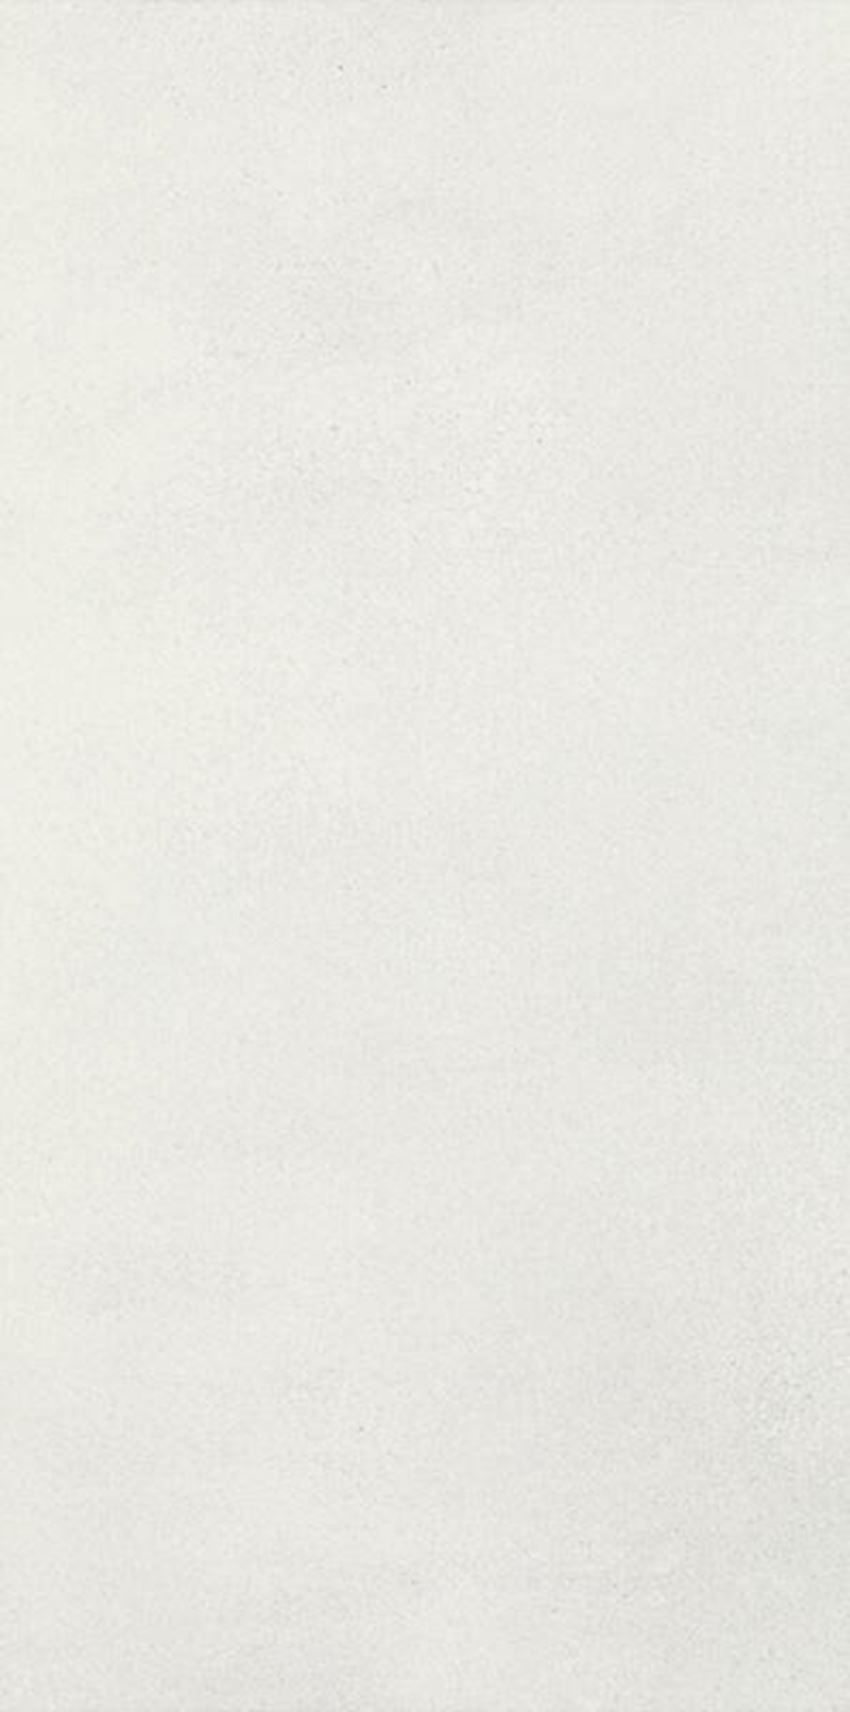 Płytka ścienna 29,5x59,5 cm Paradyż Taiga Silver Ściana Rekt.